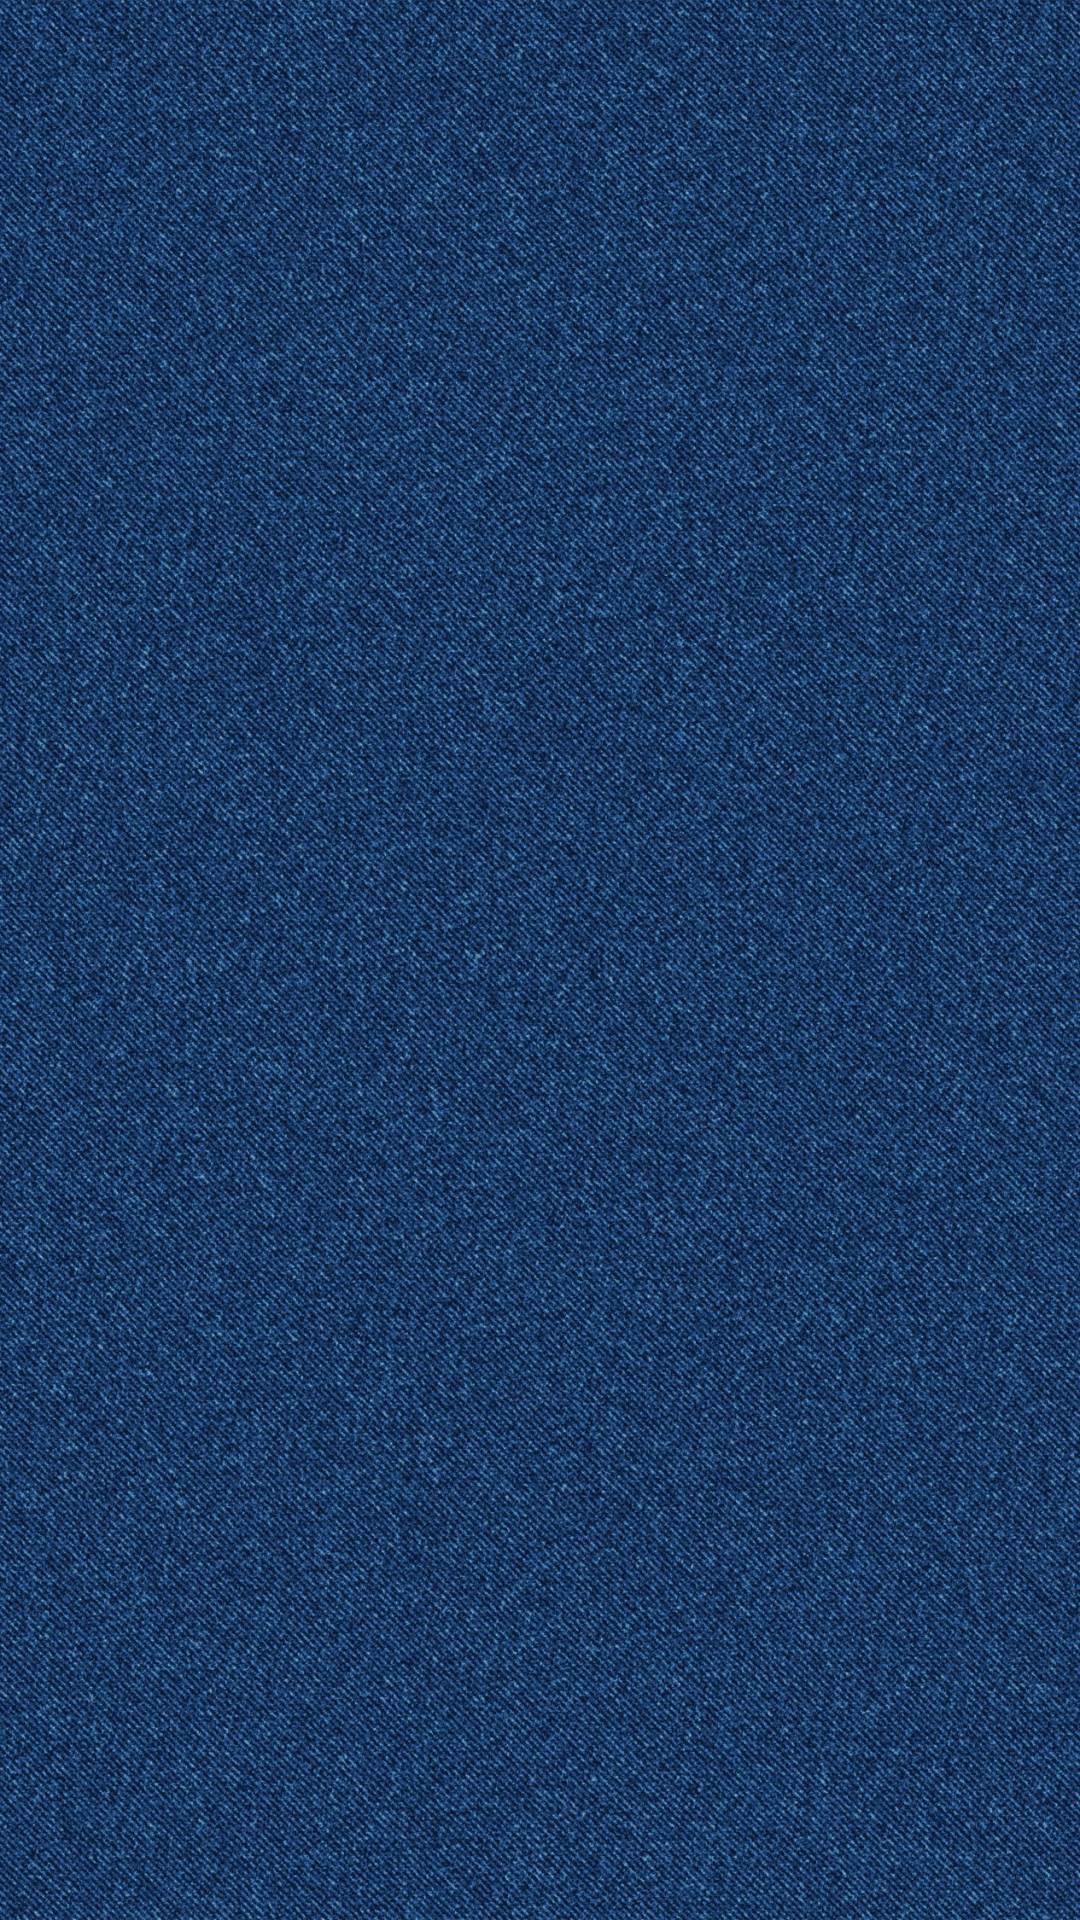 Color Paint Lock Screen 1080x1920 Samsung Galaxy S4 Wallpaper ...